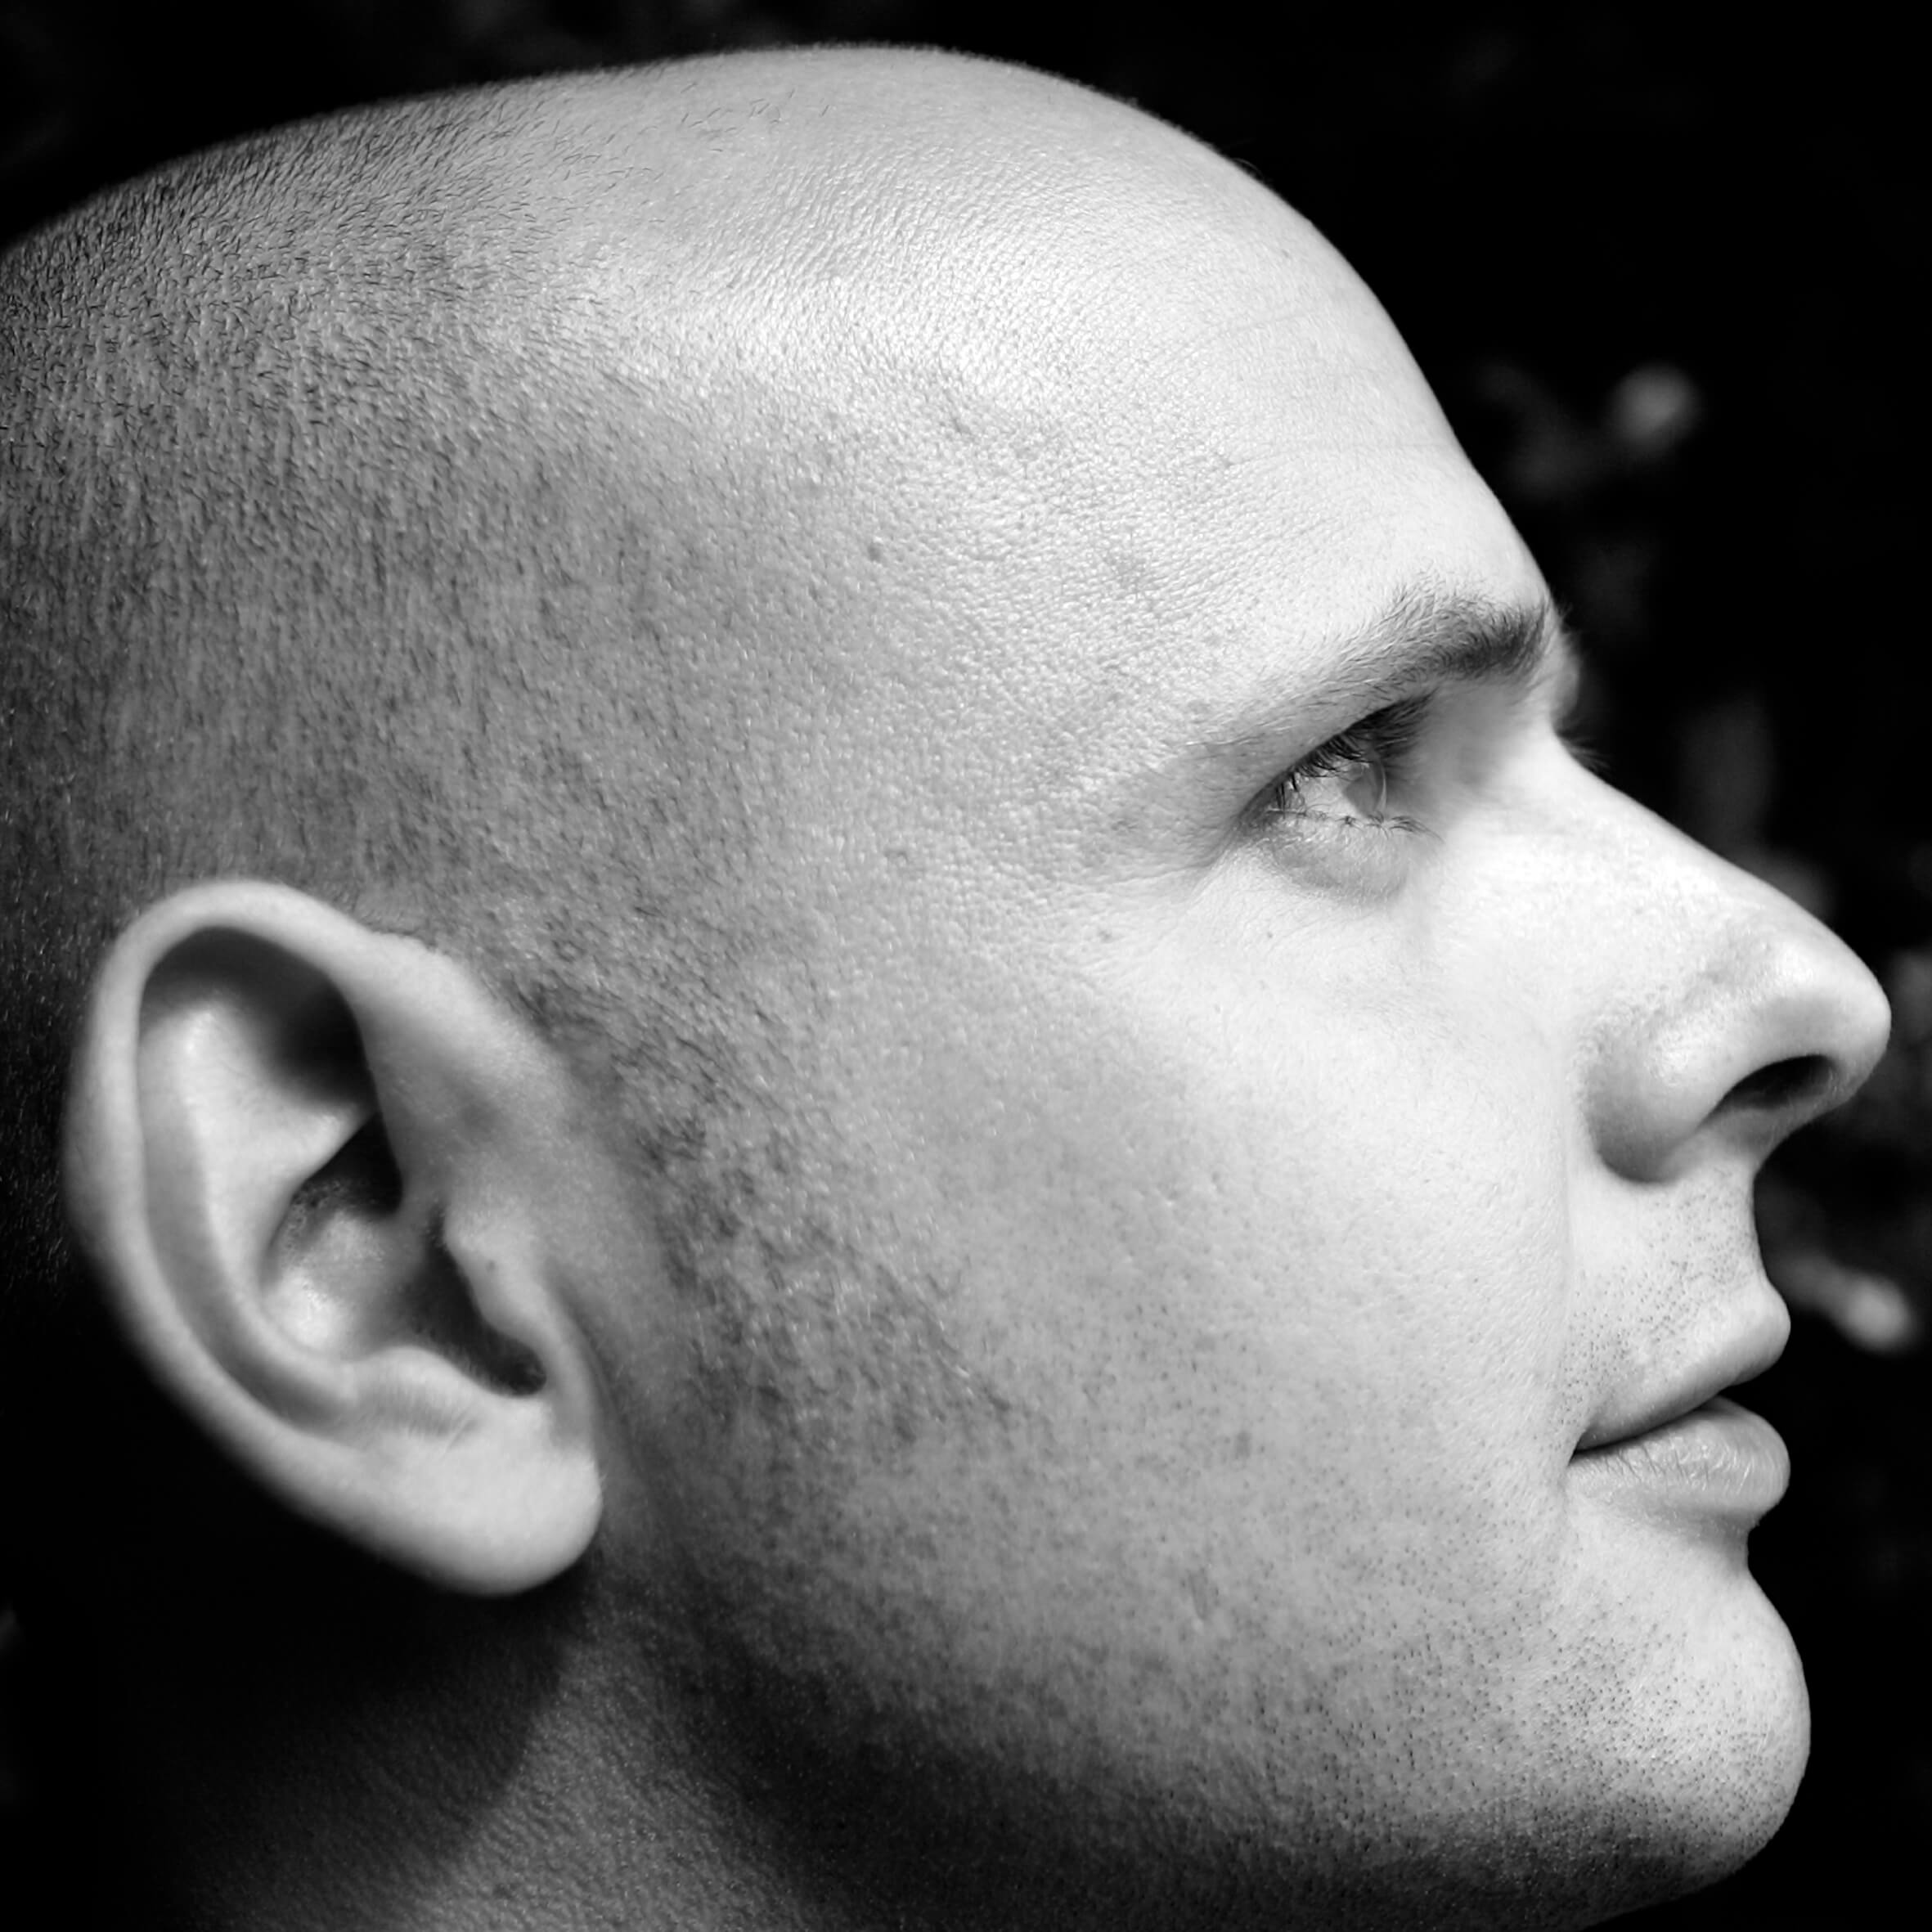 Jurjen Poeles fotografie Jona Geers landschapsarchitect architect portret karakter zwart-wit mtd landschapsarchitecten